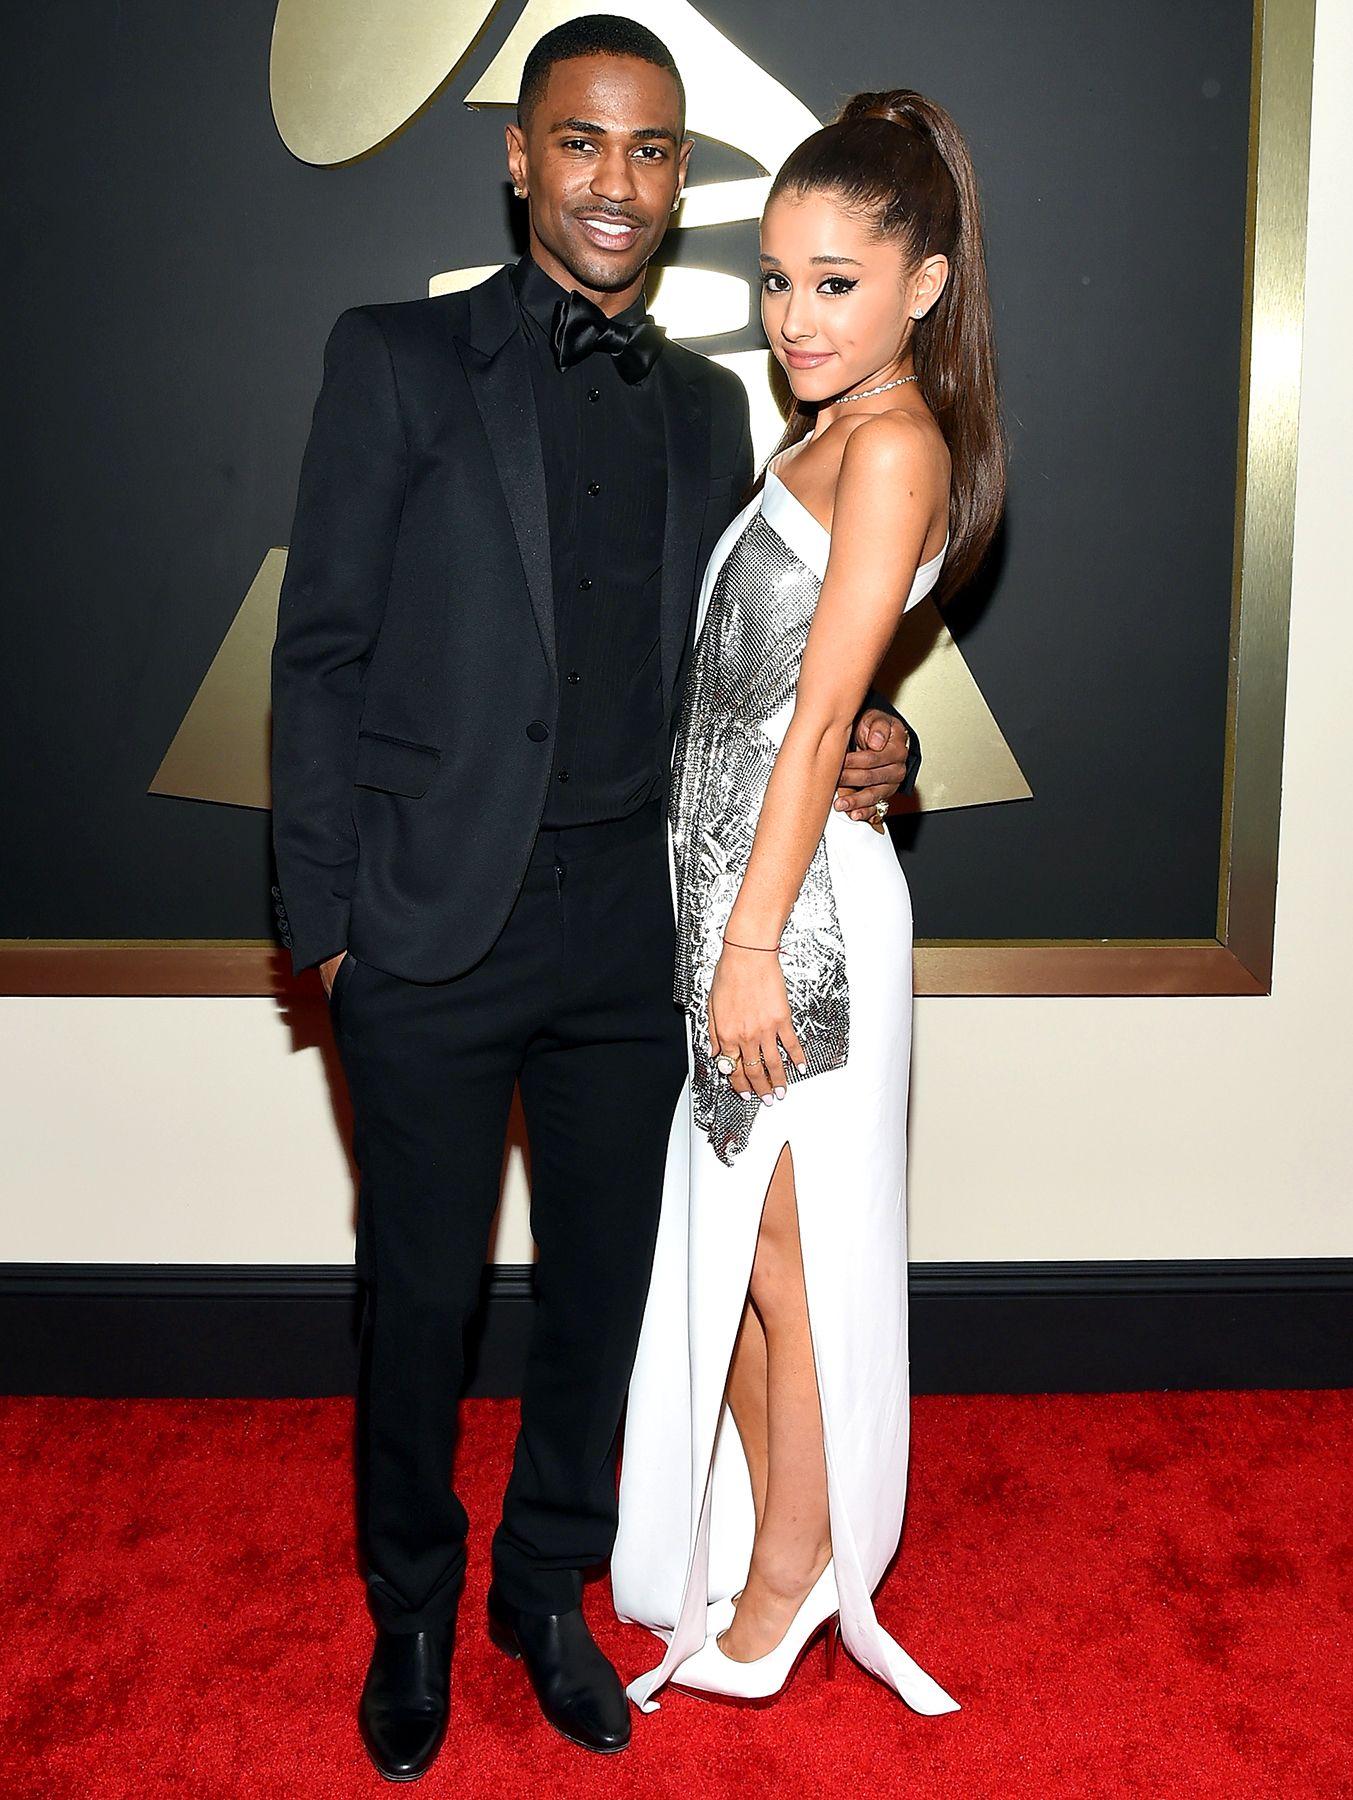 Ariana Grande Grammys: Where Was Ariana on Grammy Night?